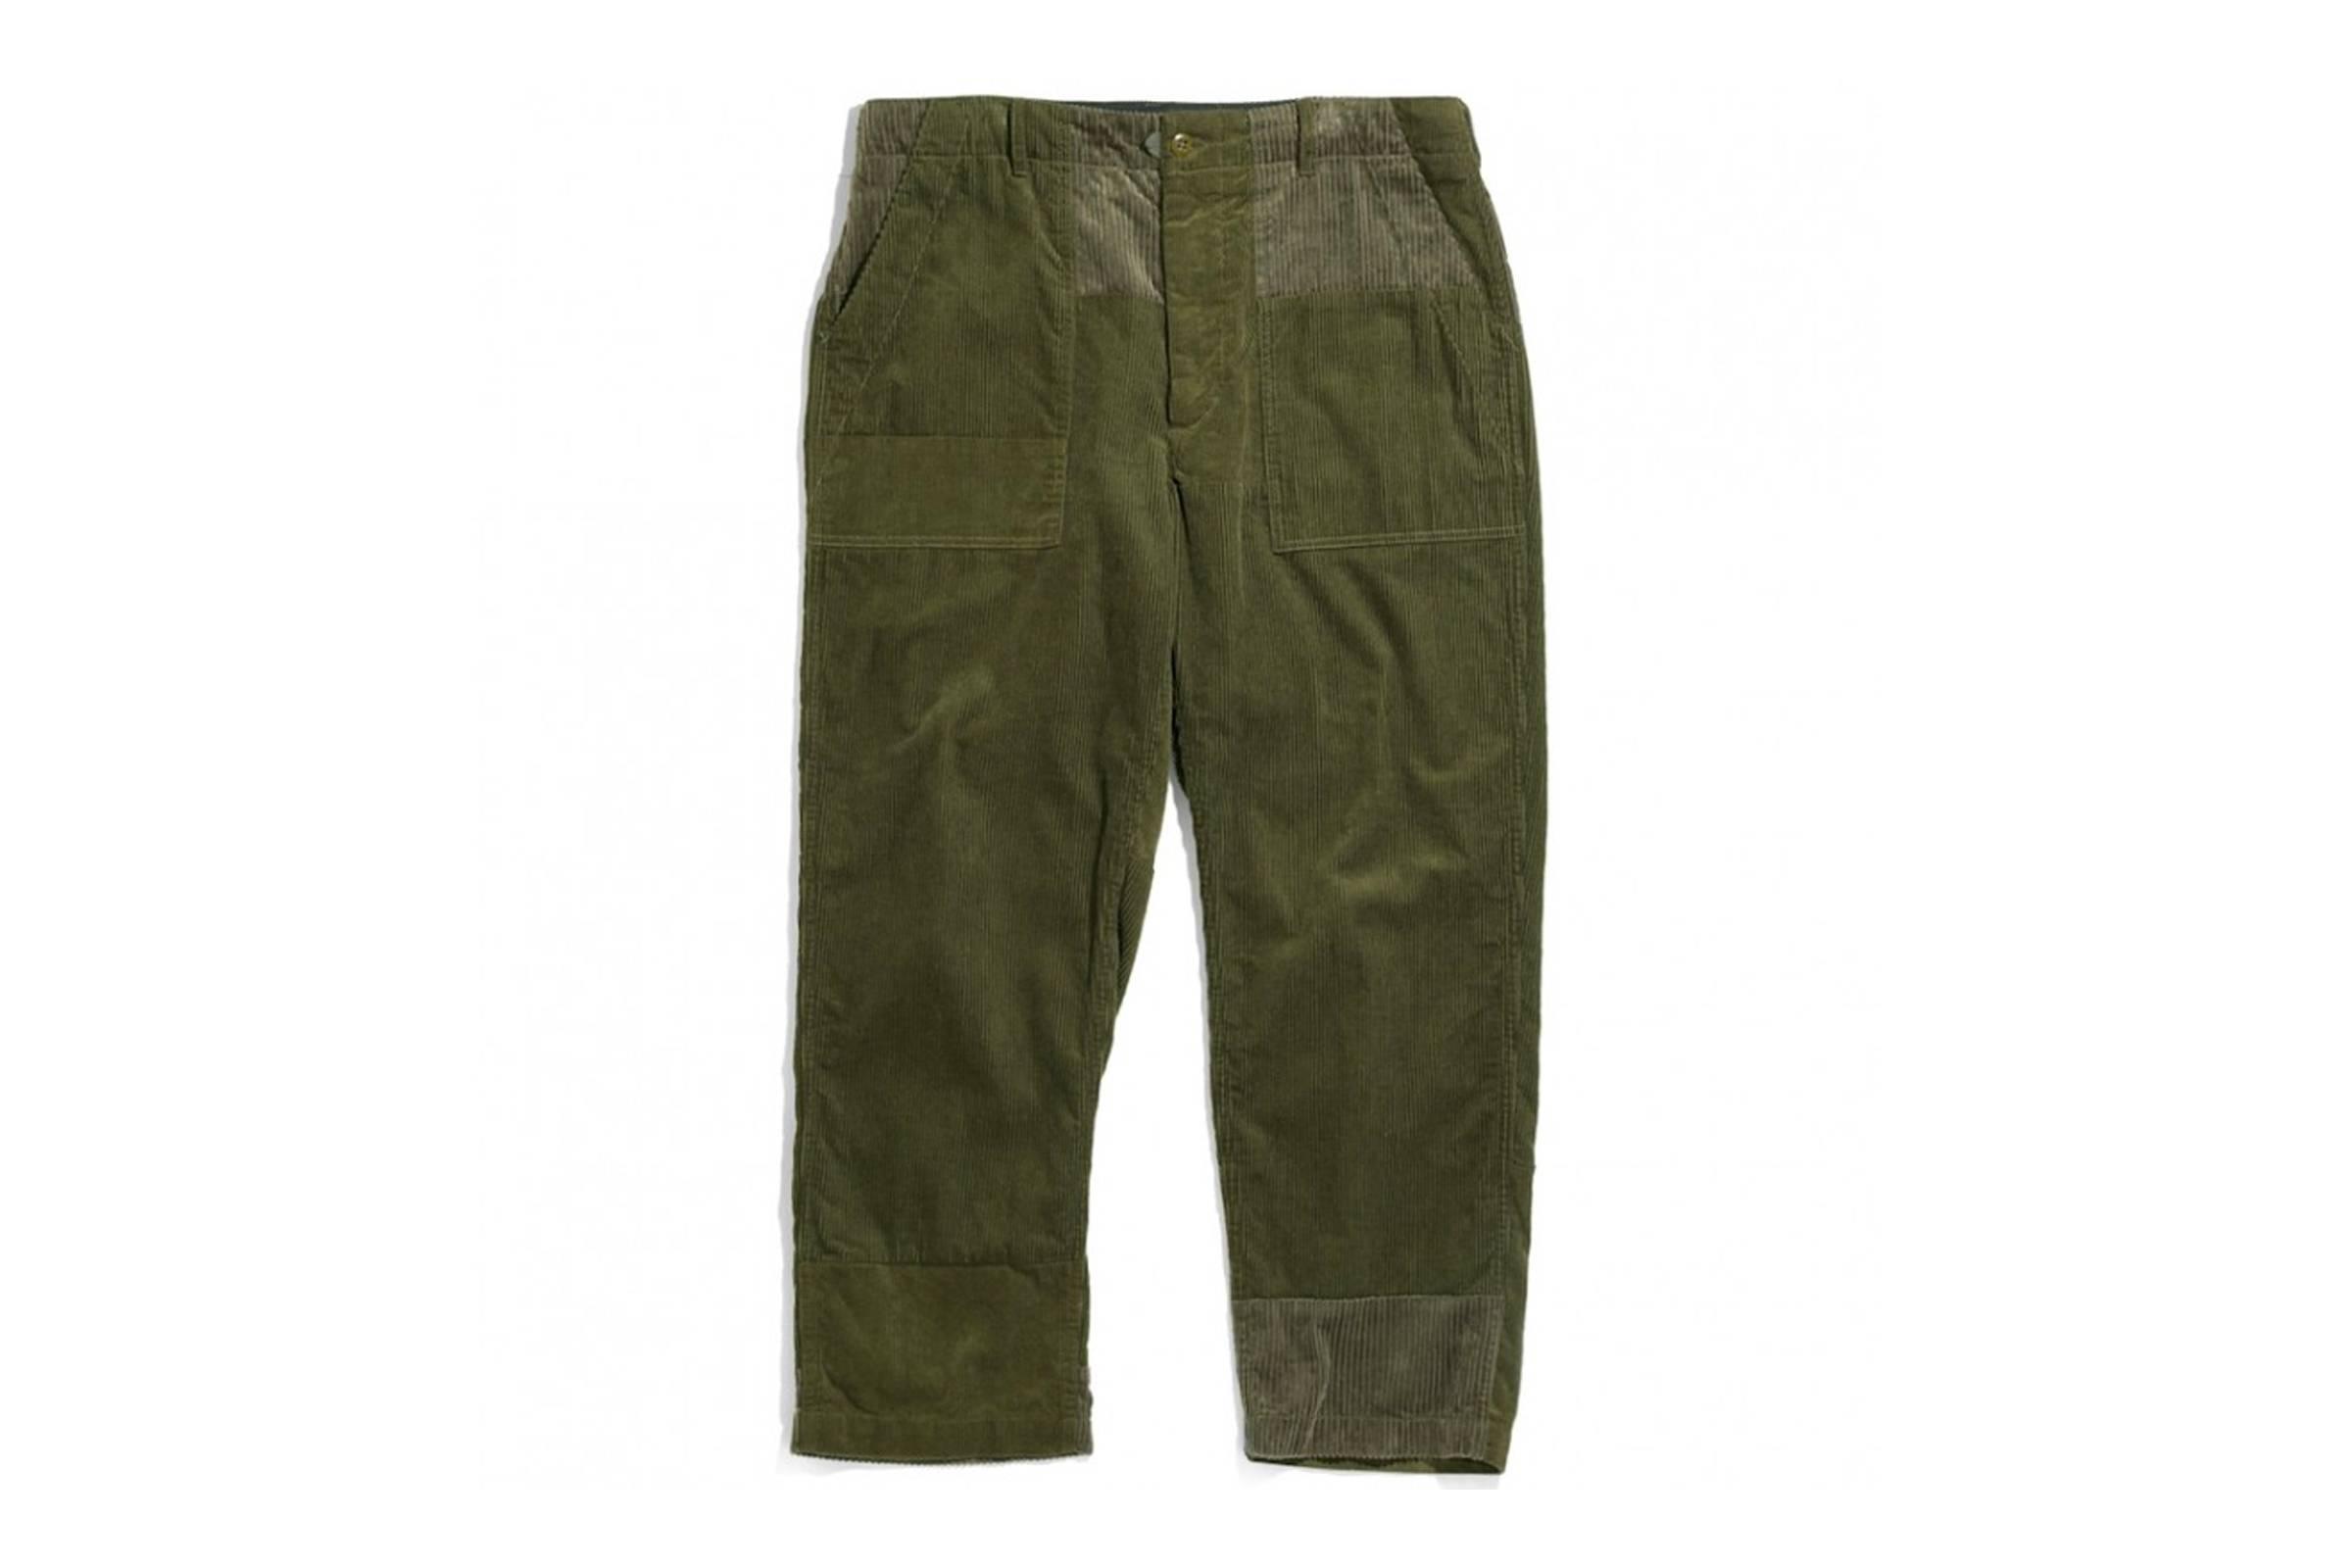 Engineered Garment Cotton-Corduroy Fatigue Pants